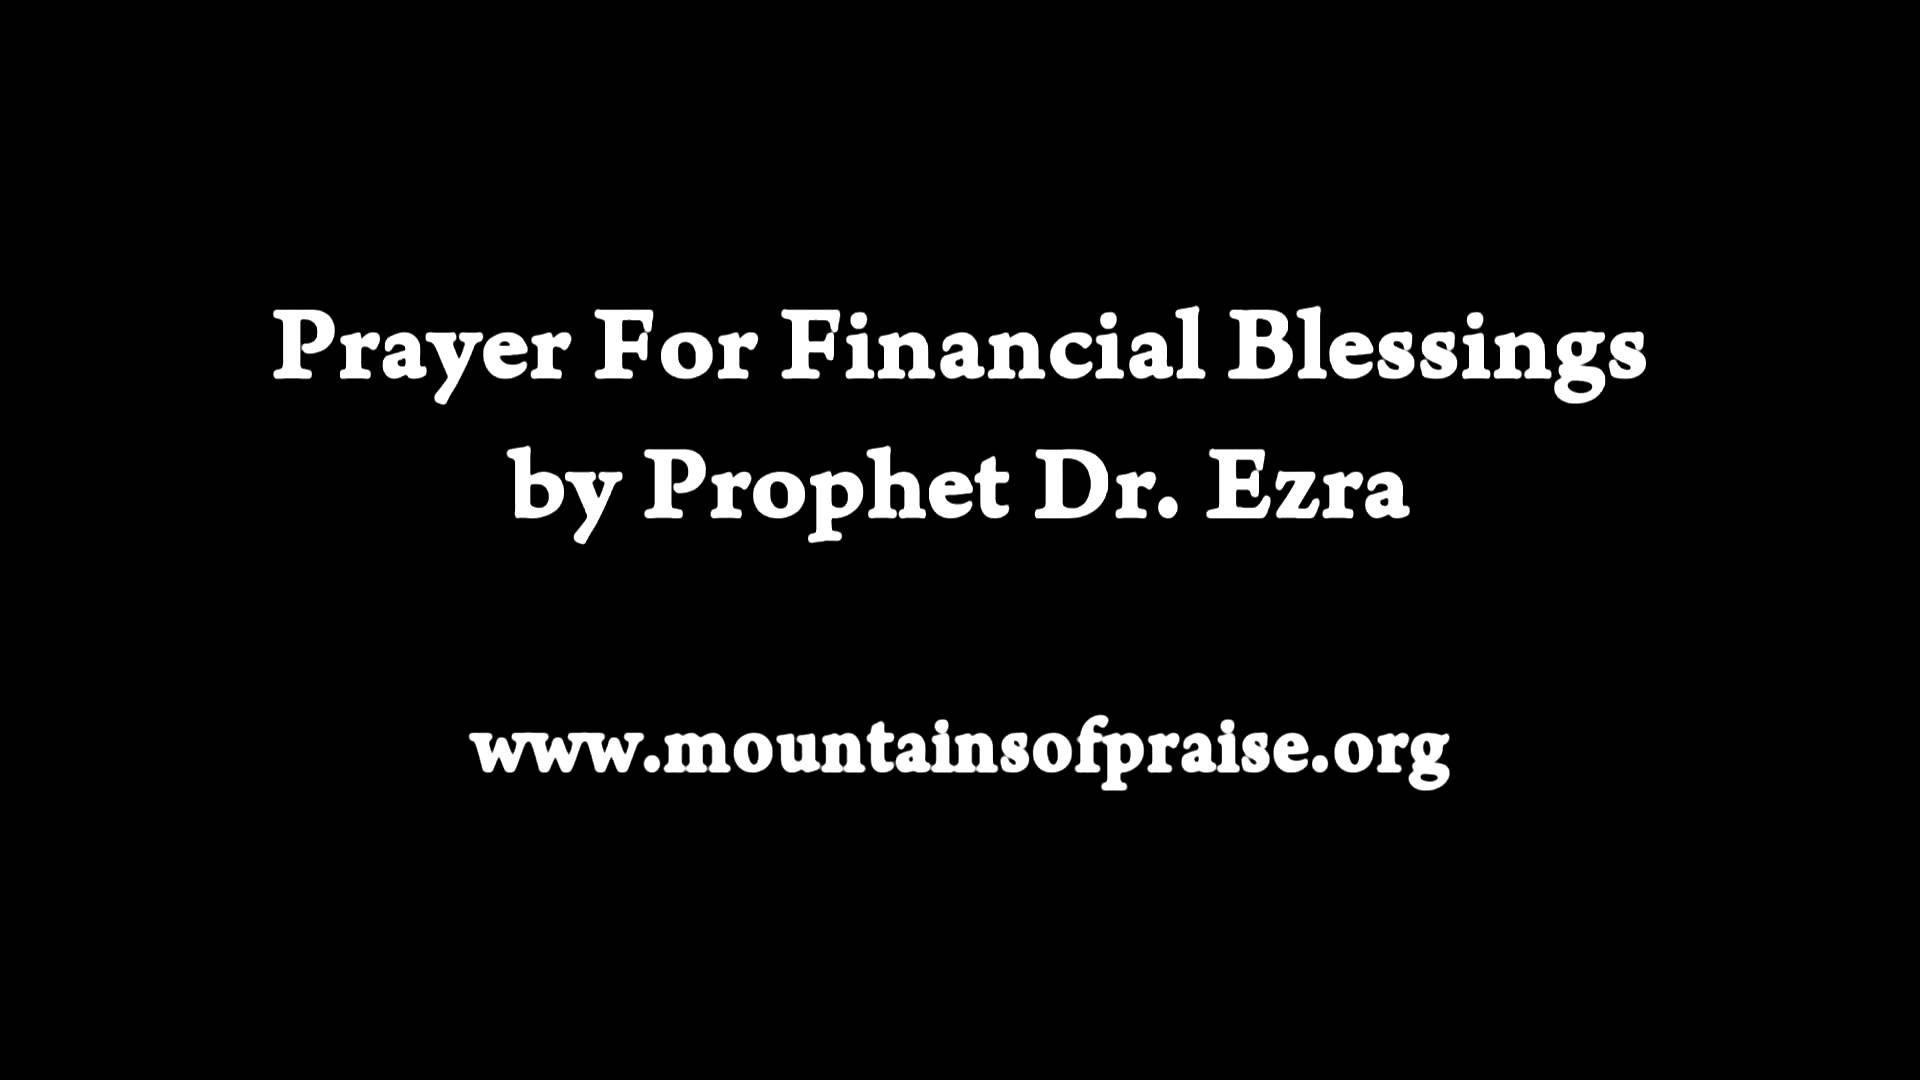 Prayer for Financial Blessing by Prophet Dr. Ezra